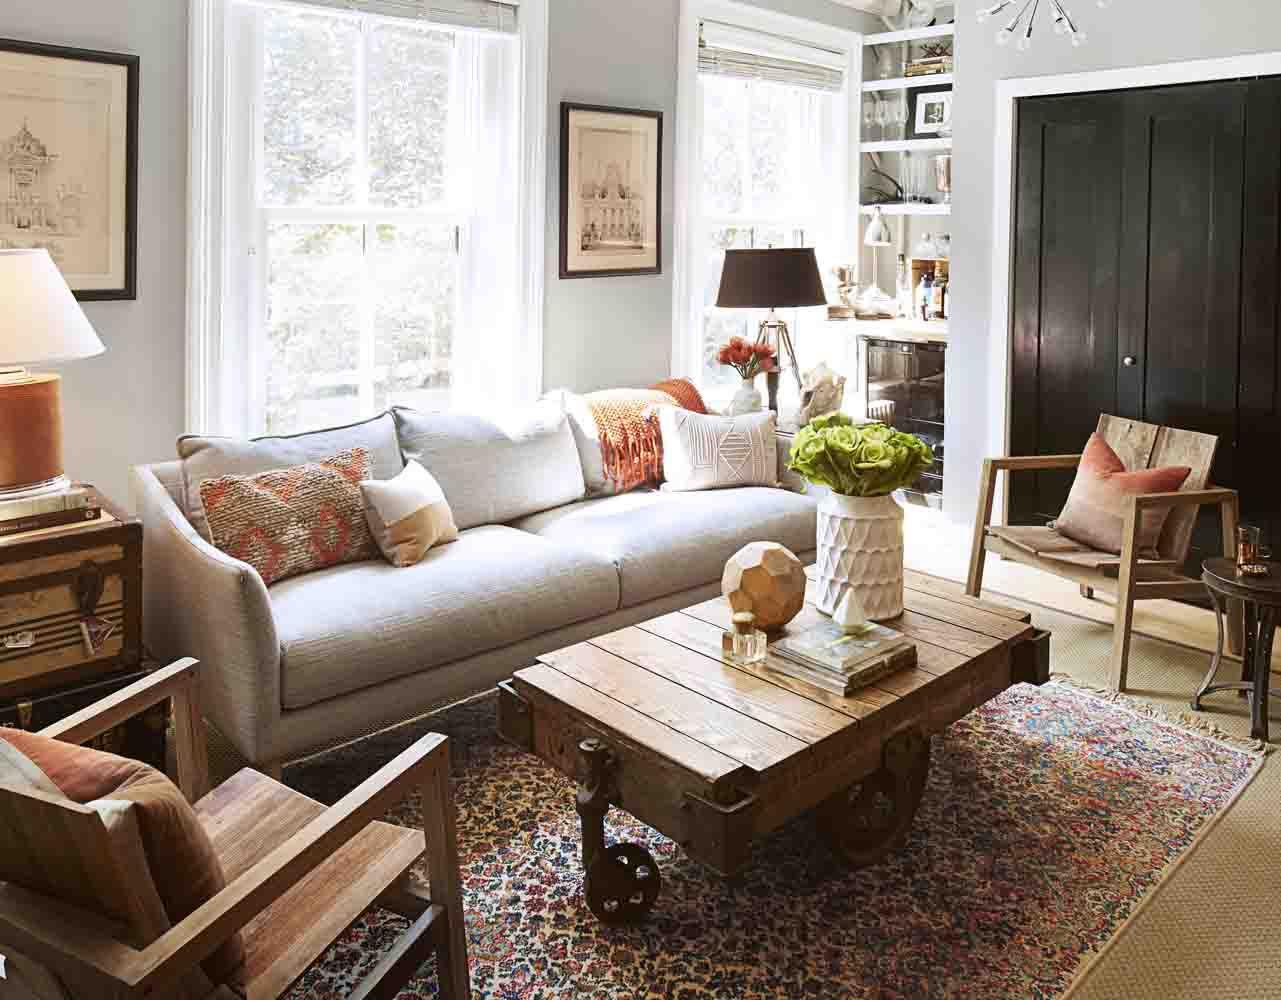 Living room furniture decorating ideas living room ceiling lights